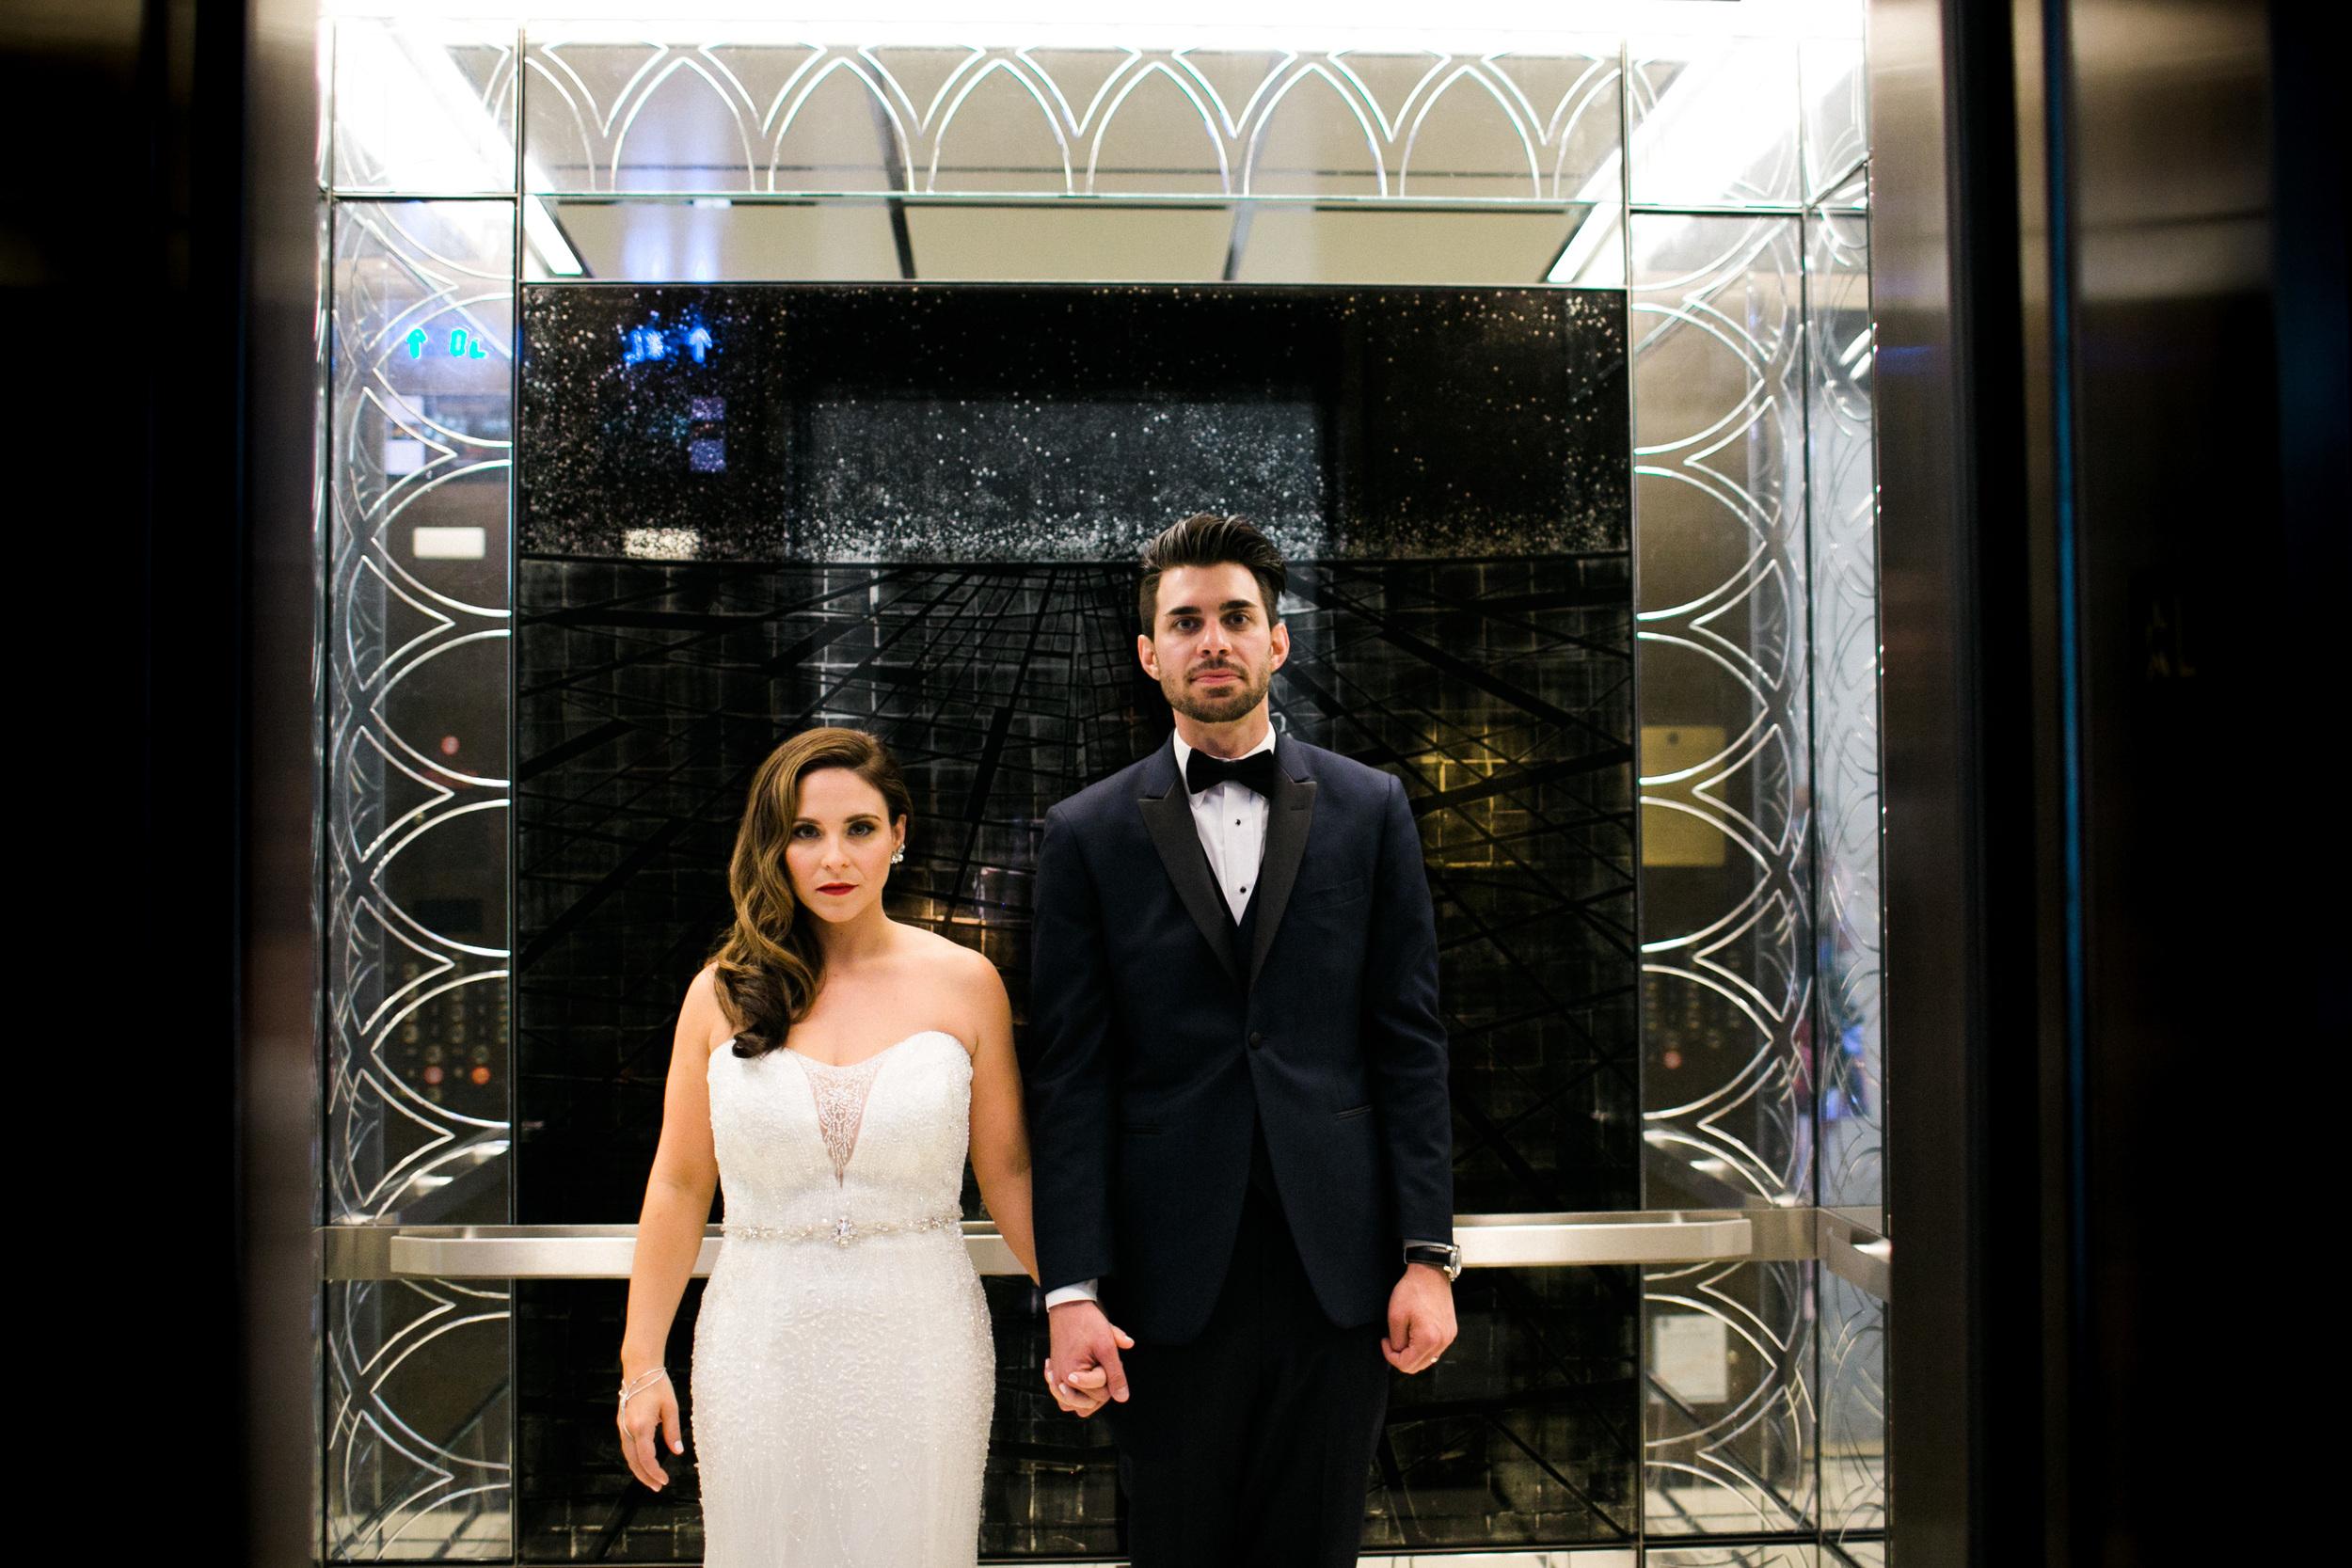 mayden_photography_weddings-42.jpg